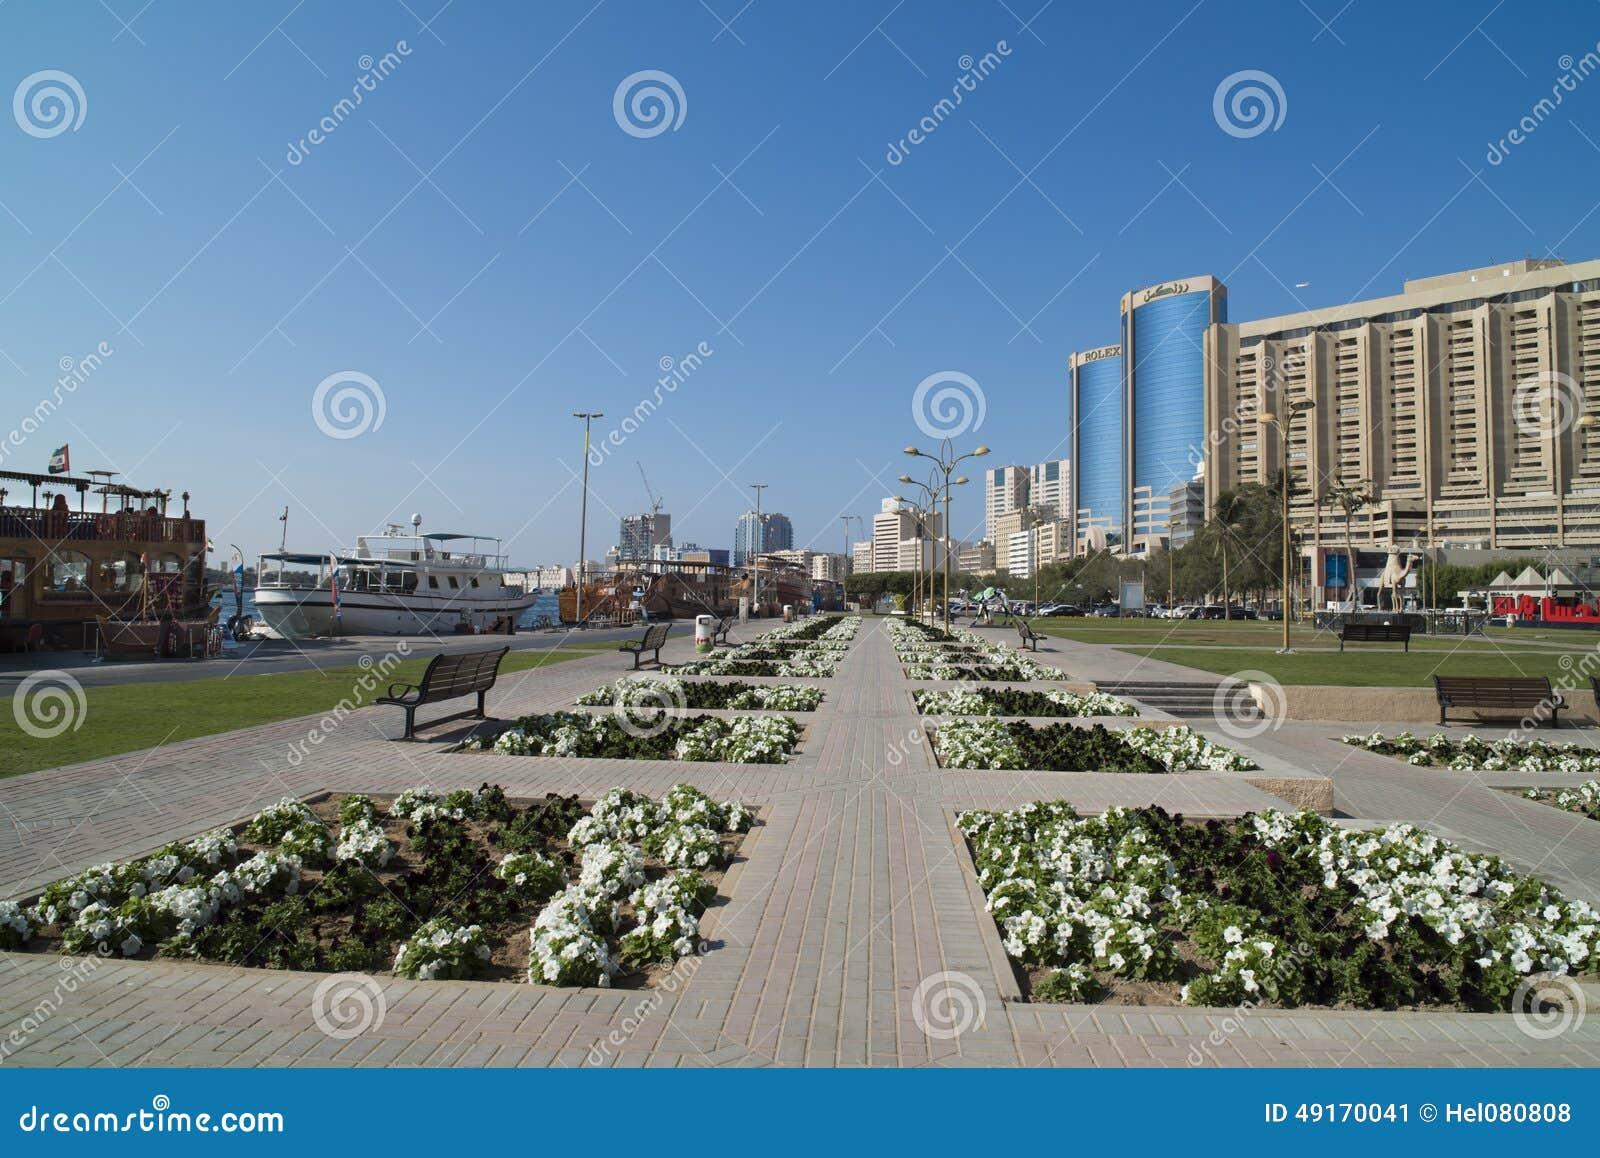 Park in Doubai